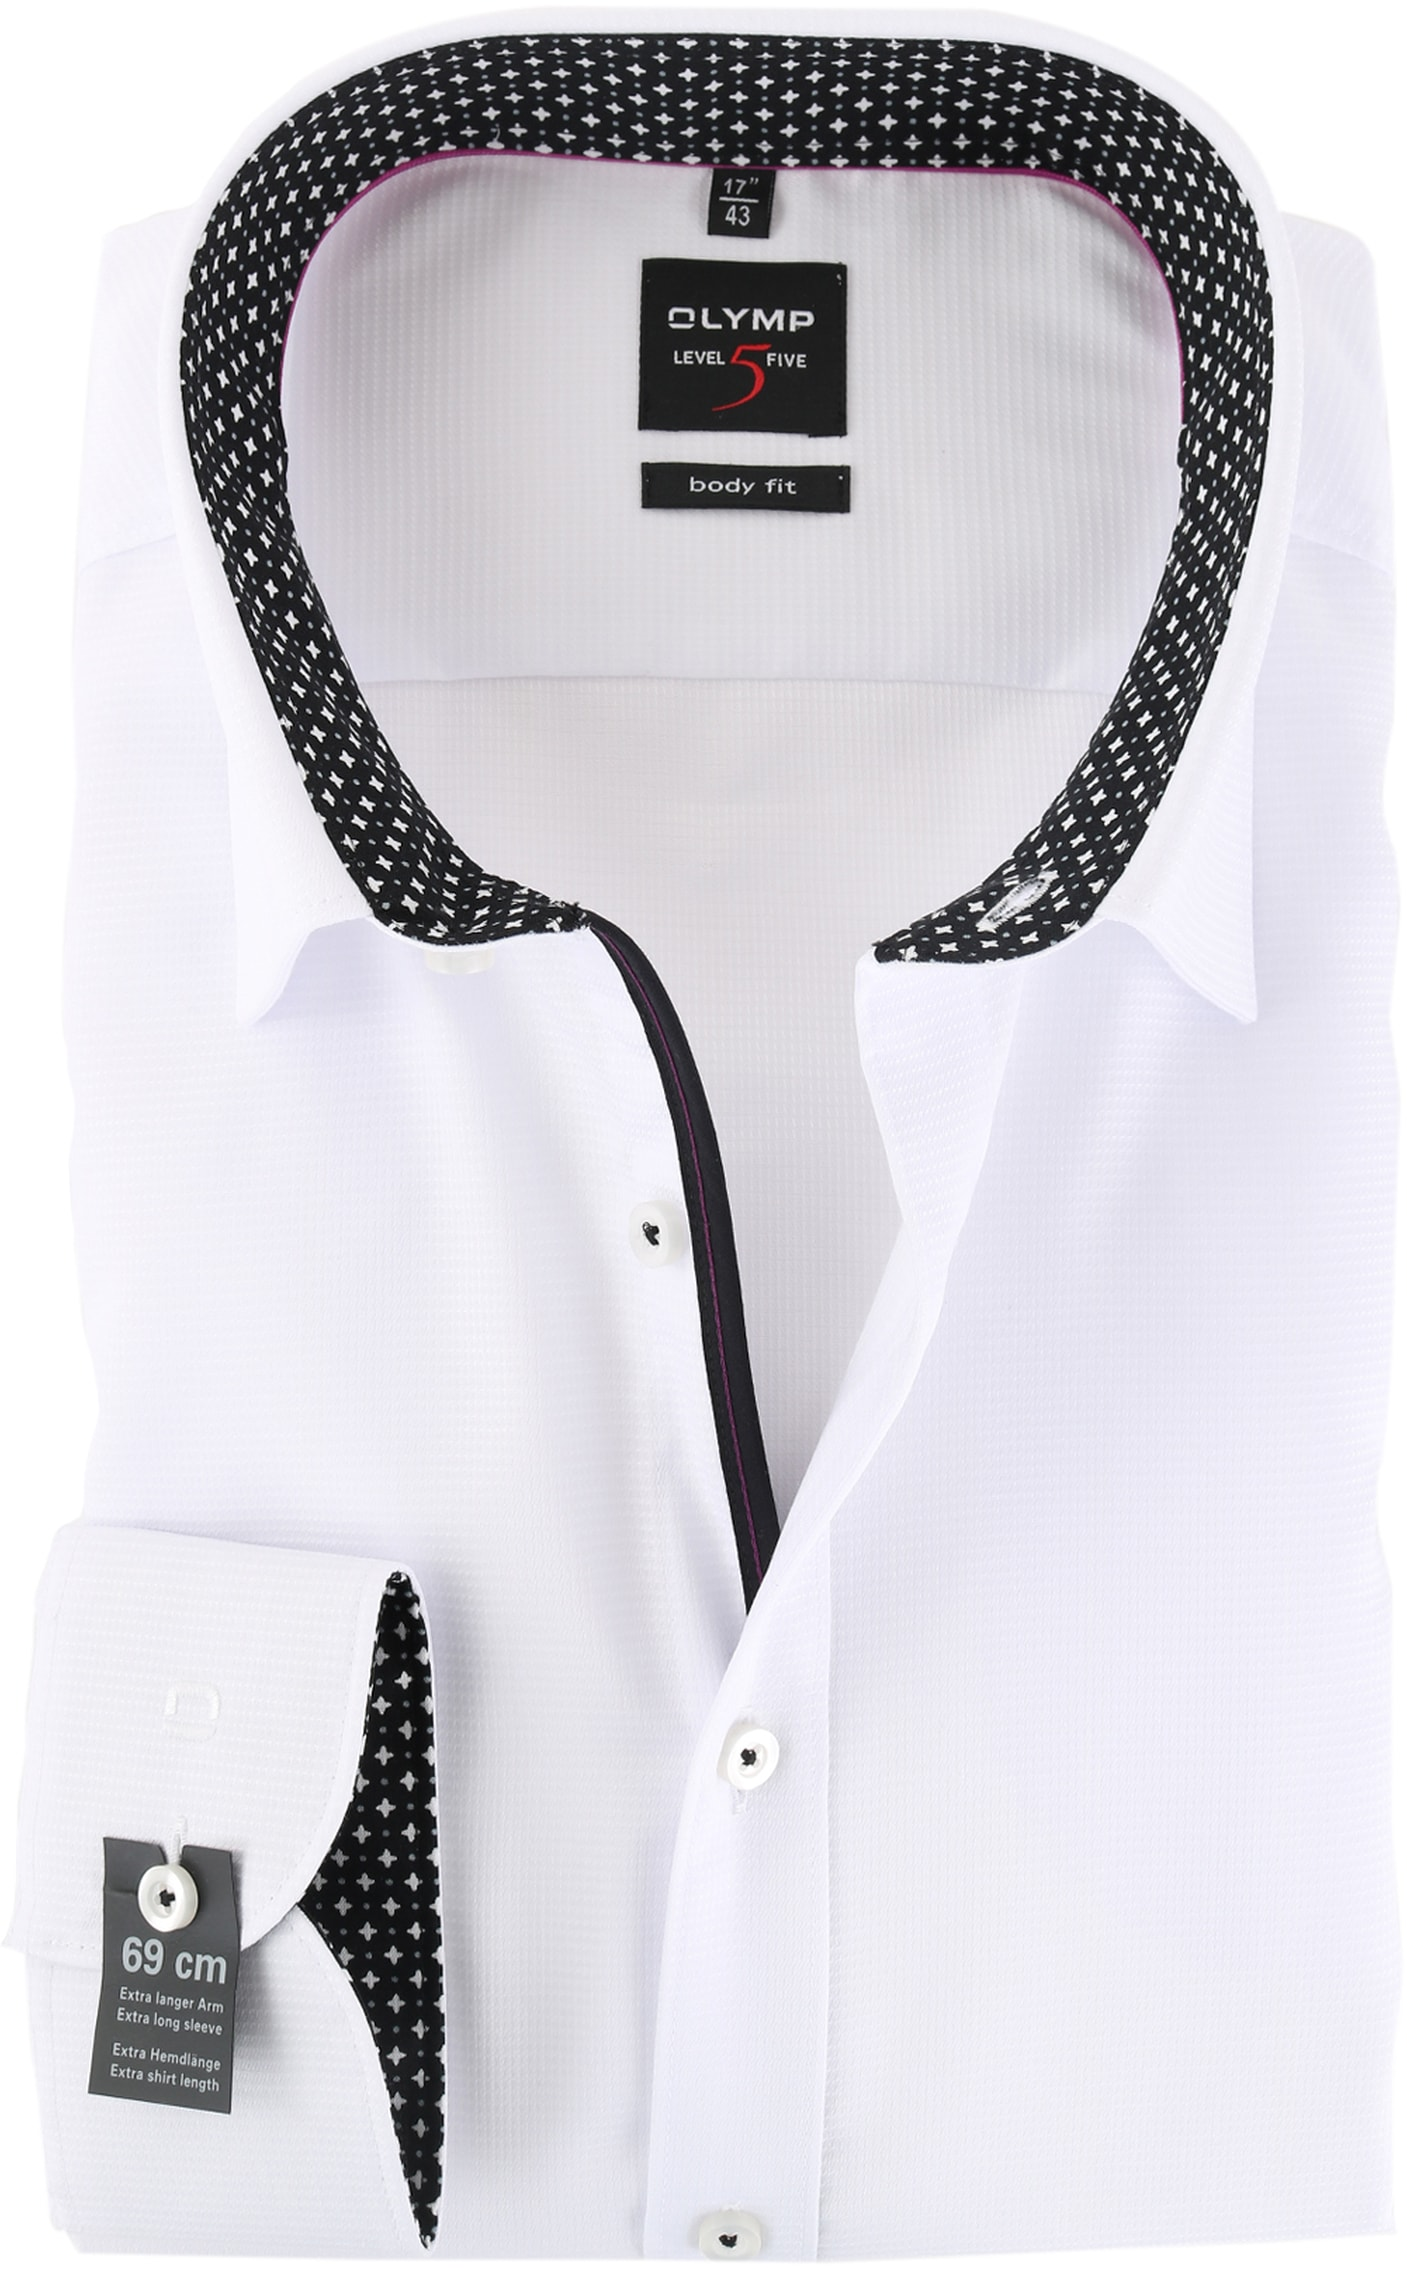 Overhemd Zwart Wit.Olymp Level Five Sl7 Overhemd Body Fit Wit Zwart 056369 Online